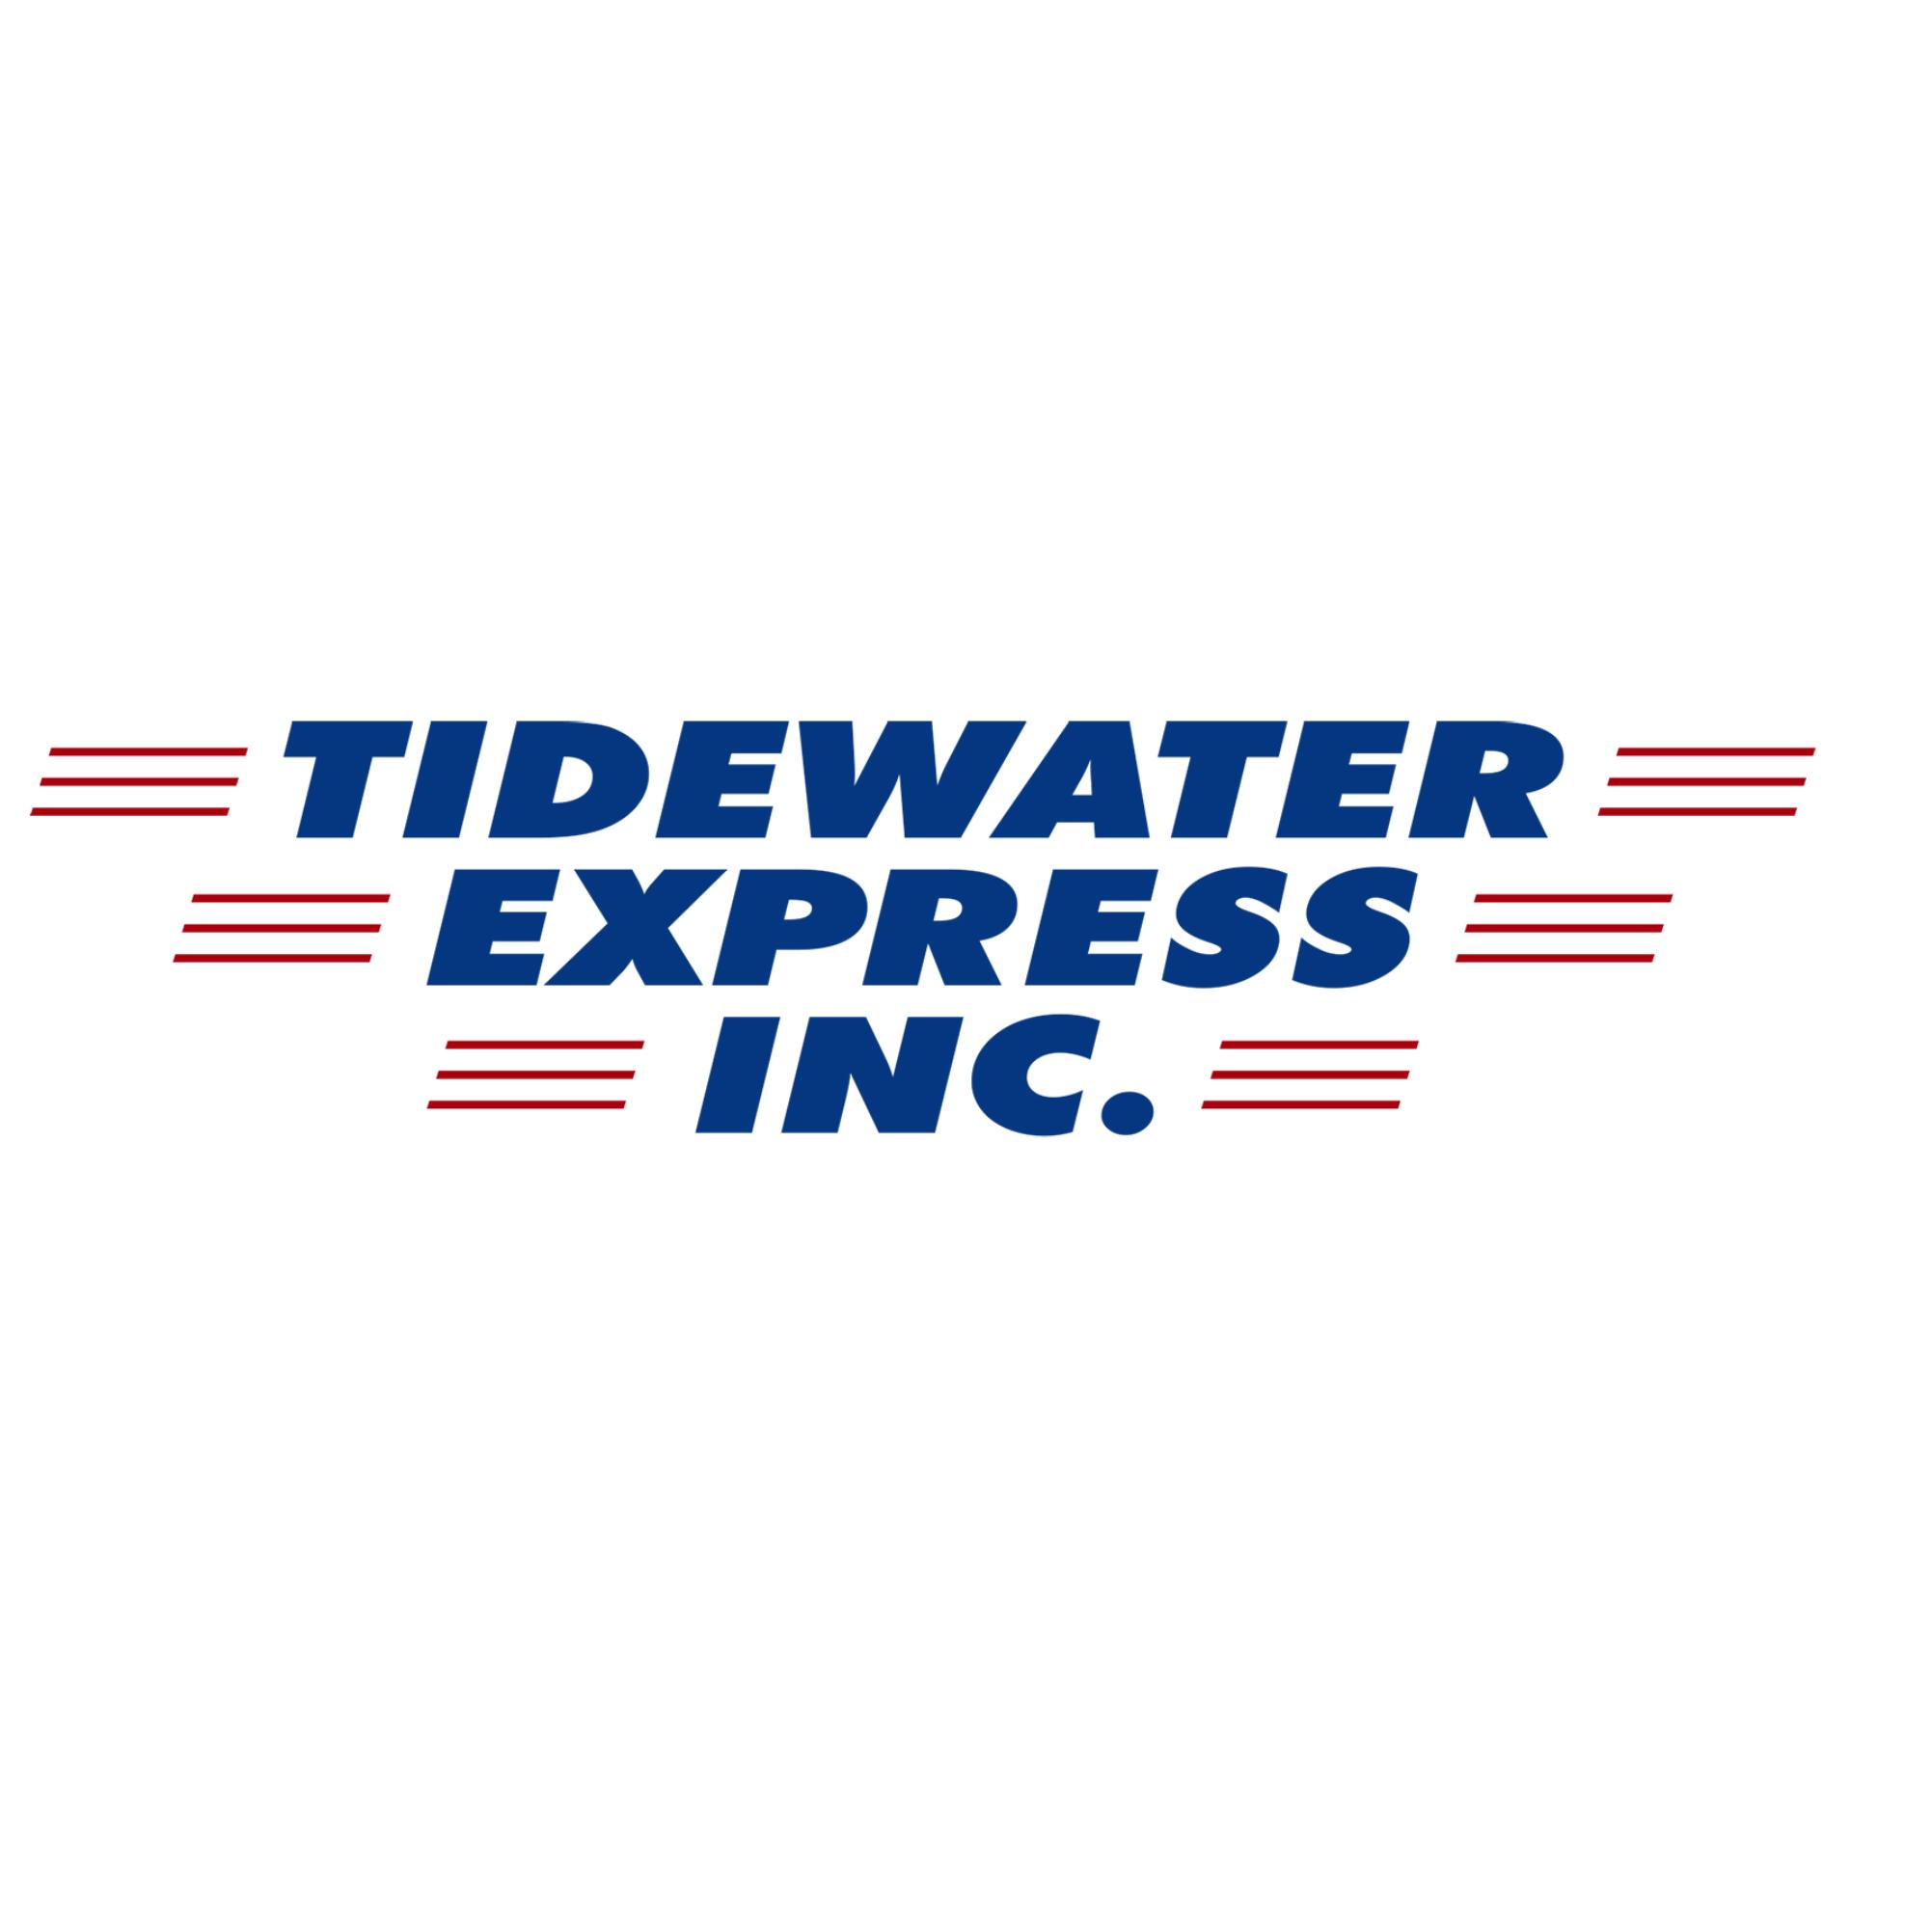 Tidewater Express Inc logo